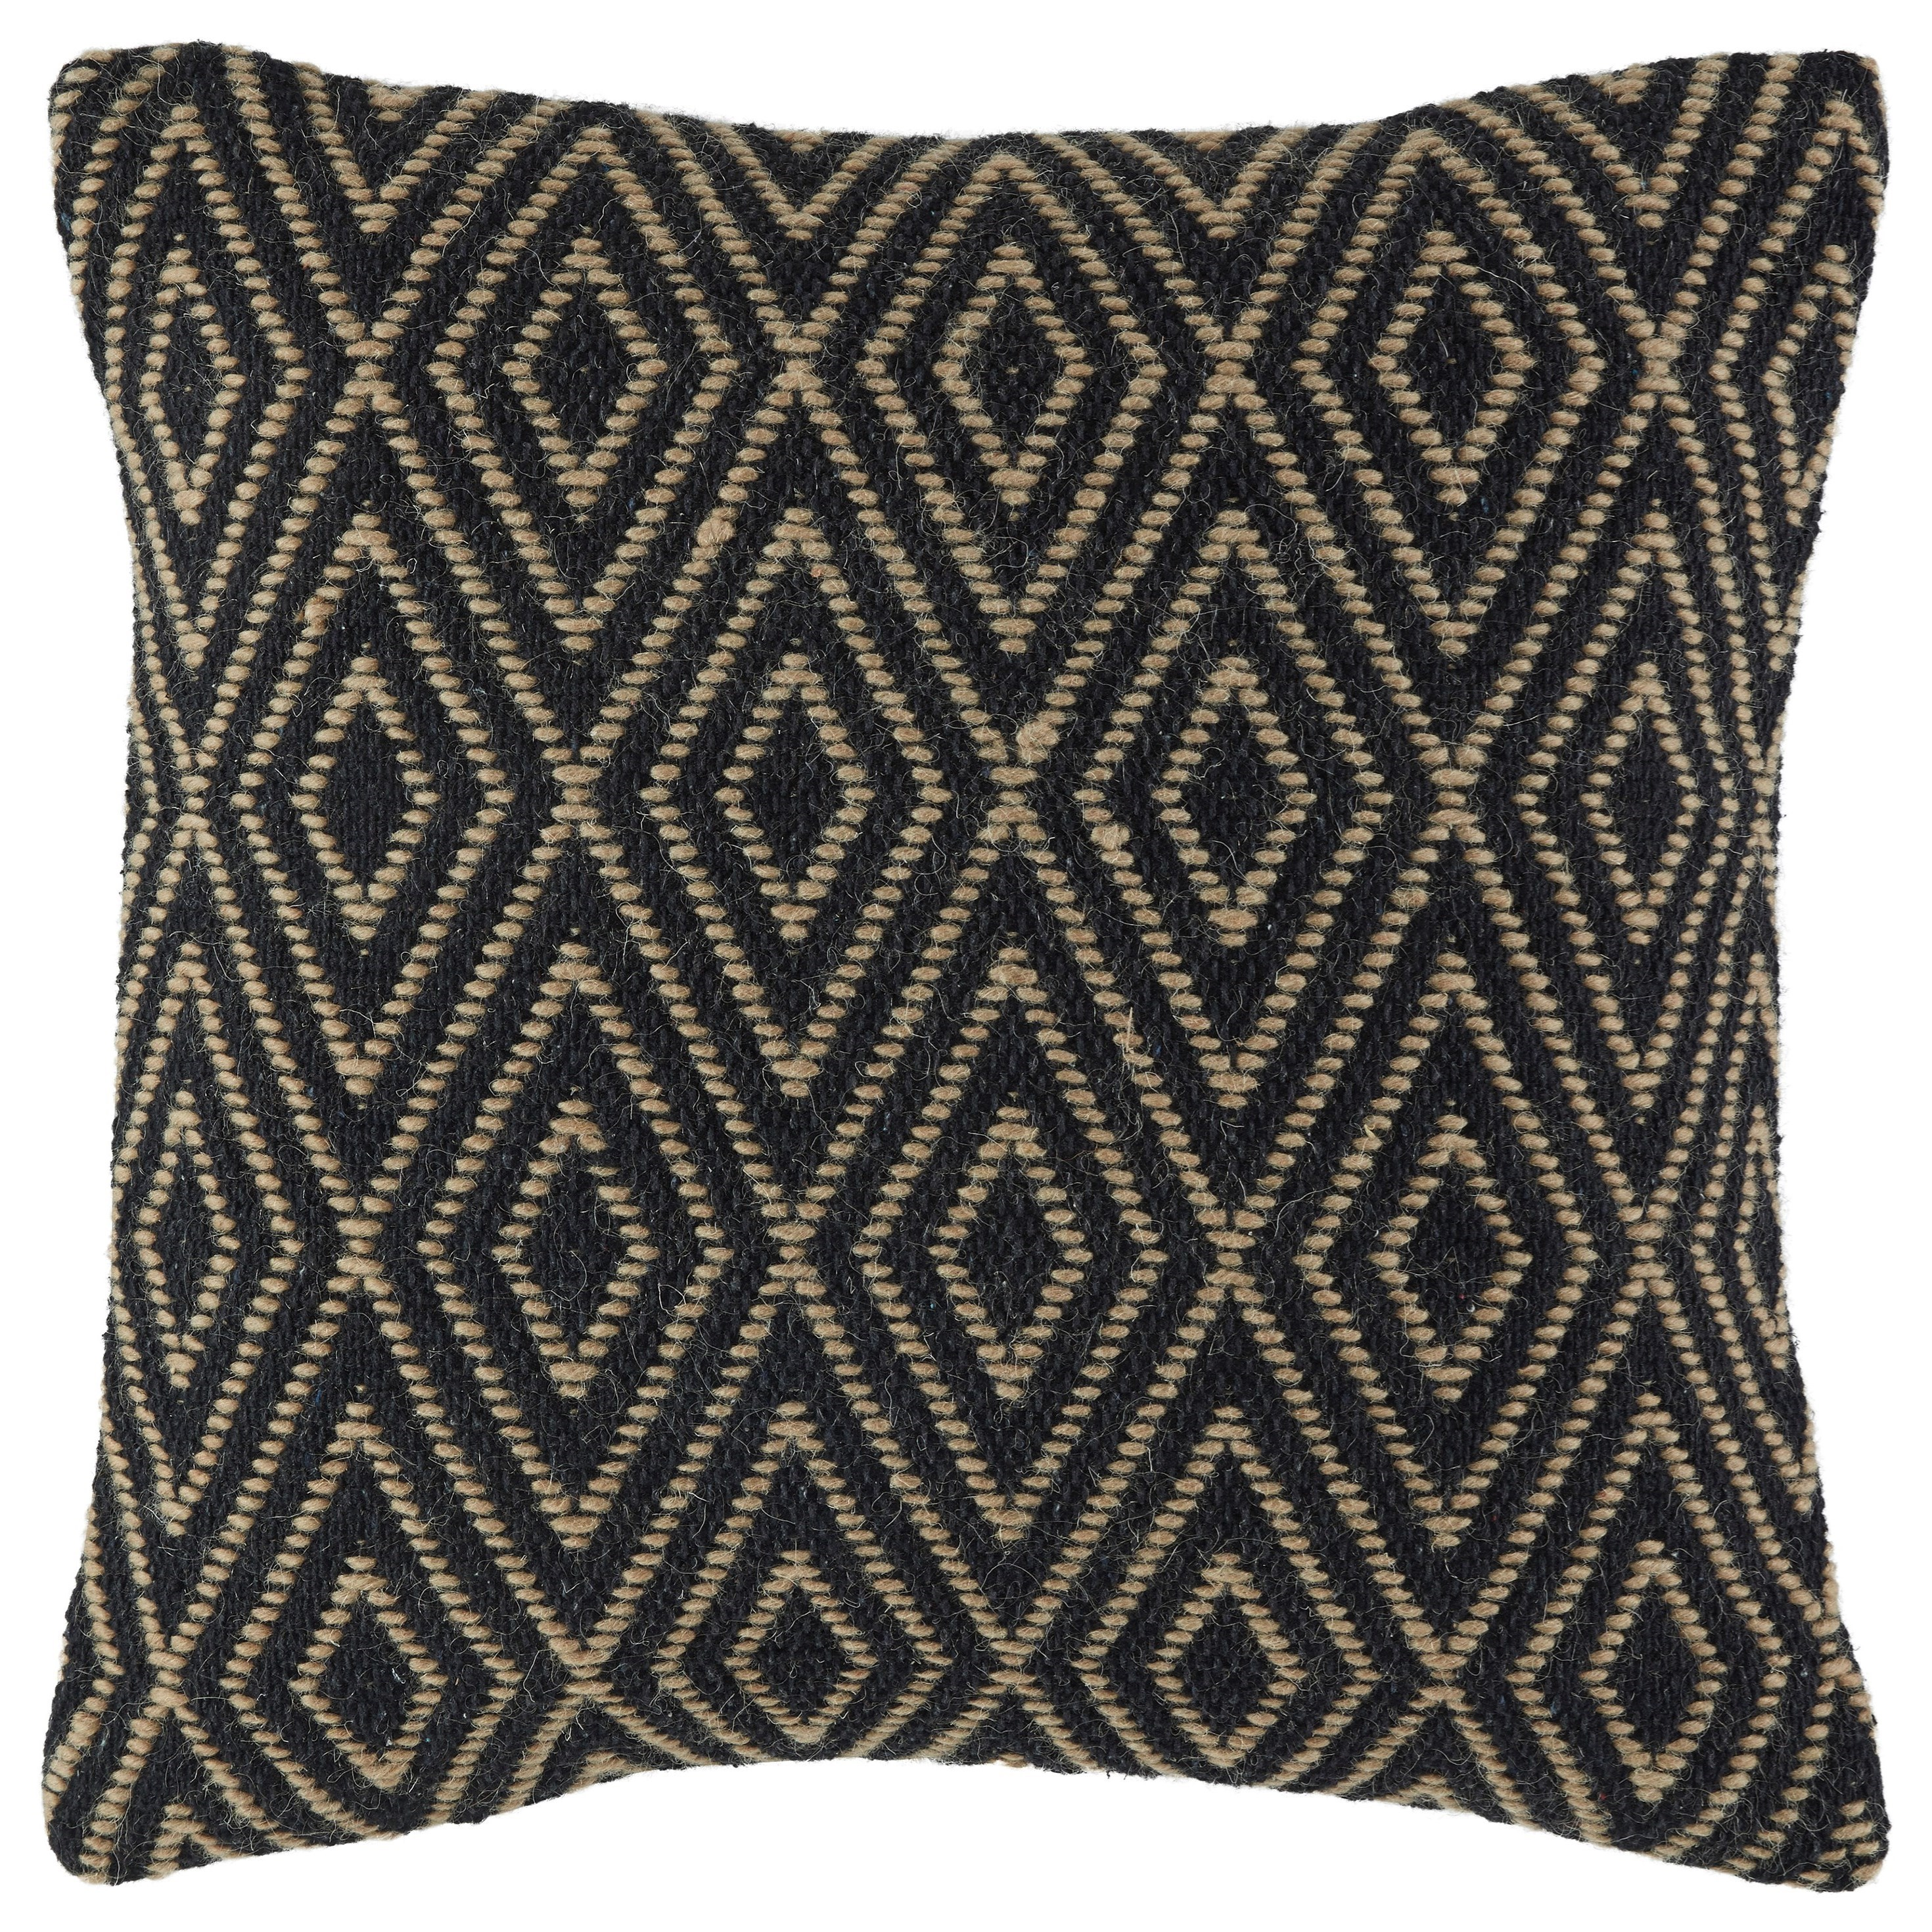 Mitt Black/Tan Pillow